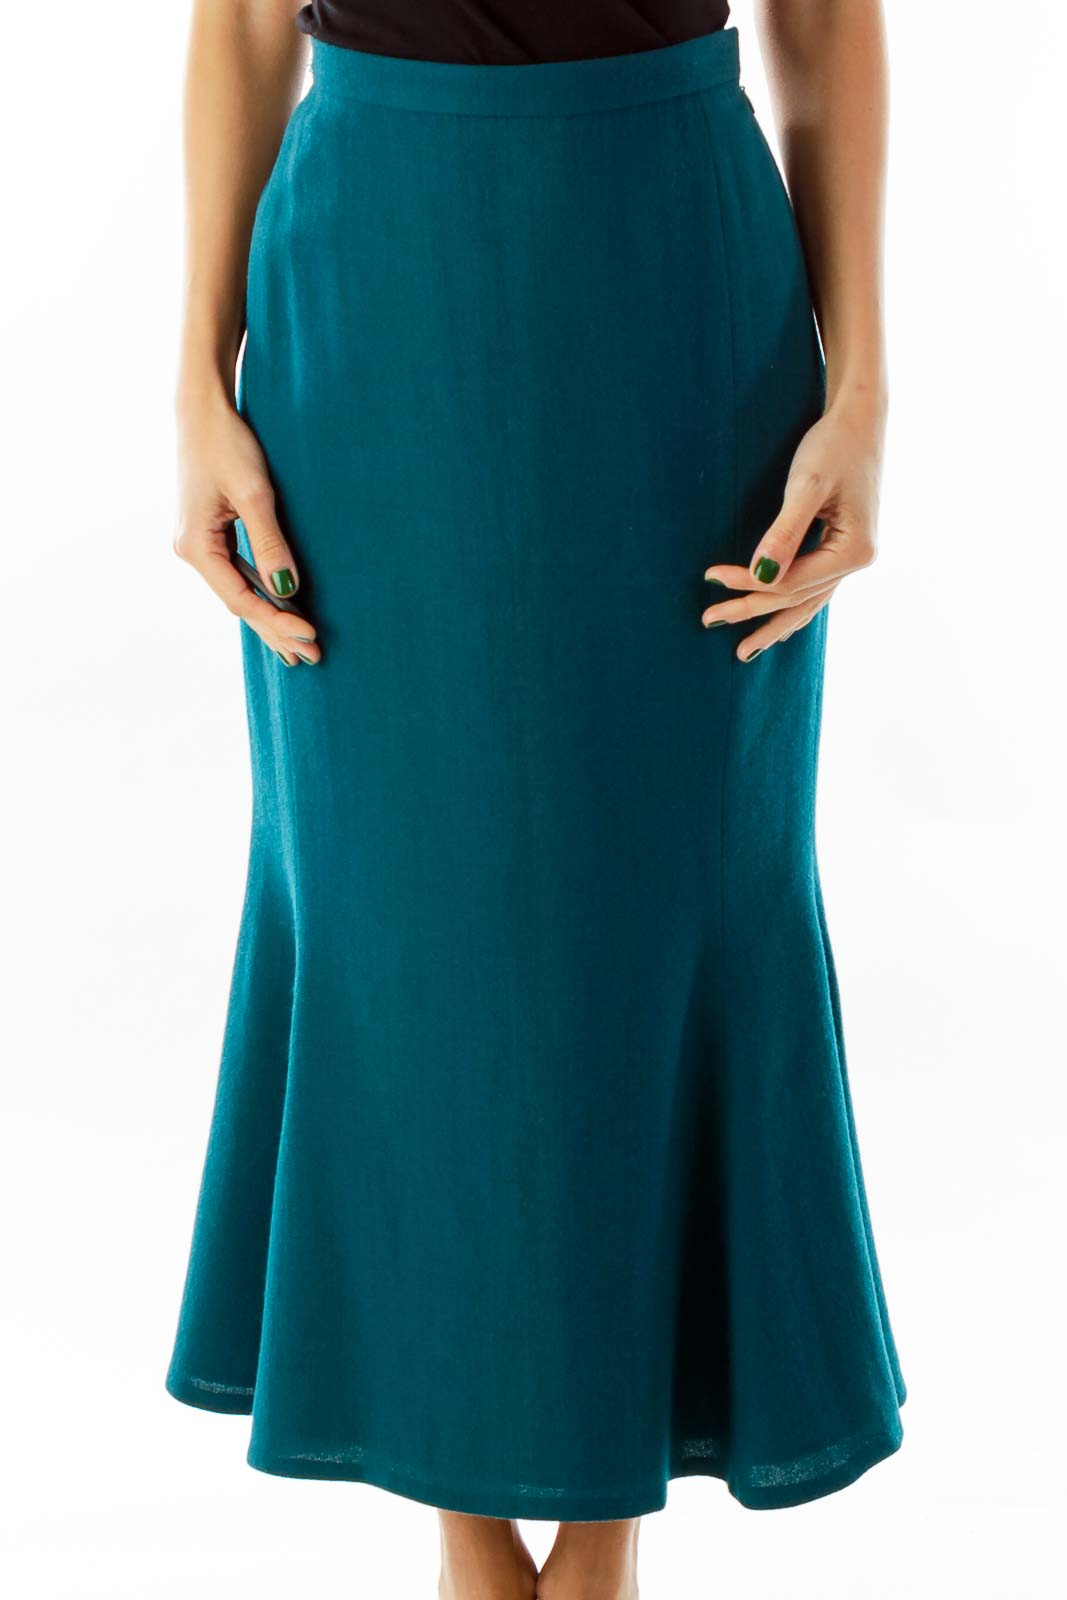 Turquoise Vintage Trumpet Skirt Front